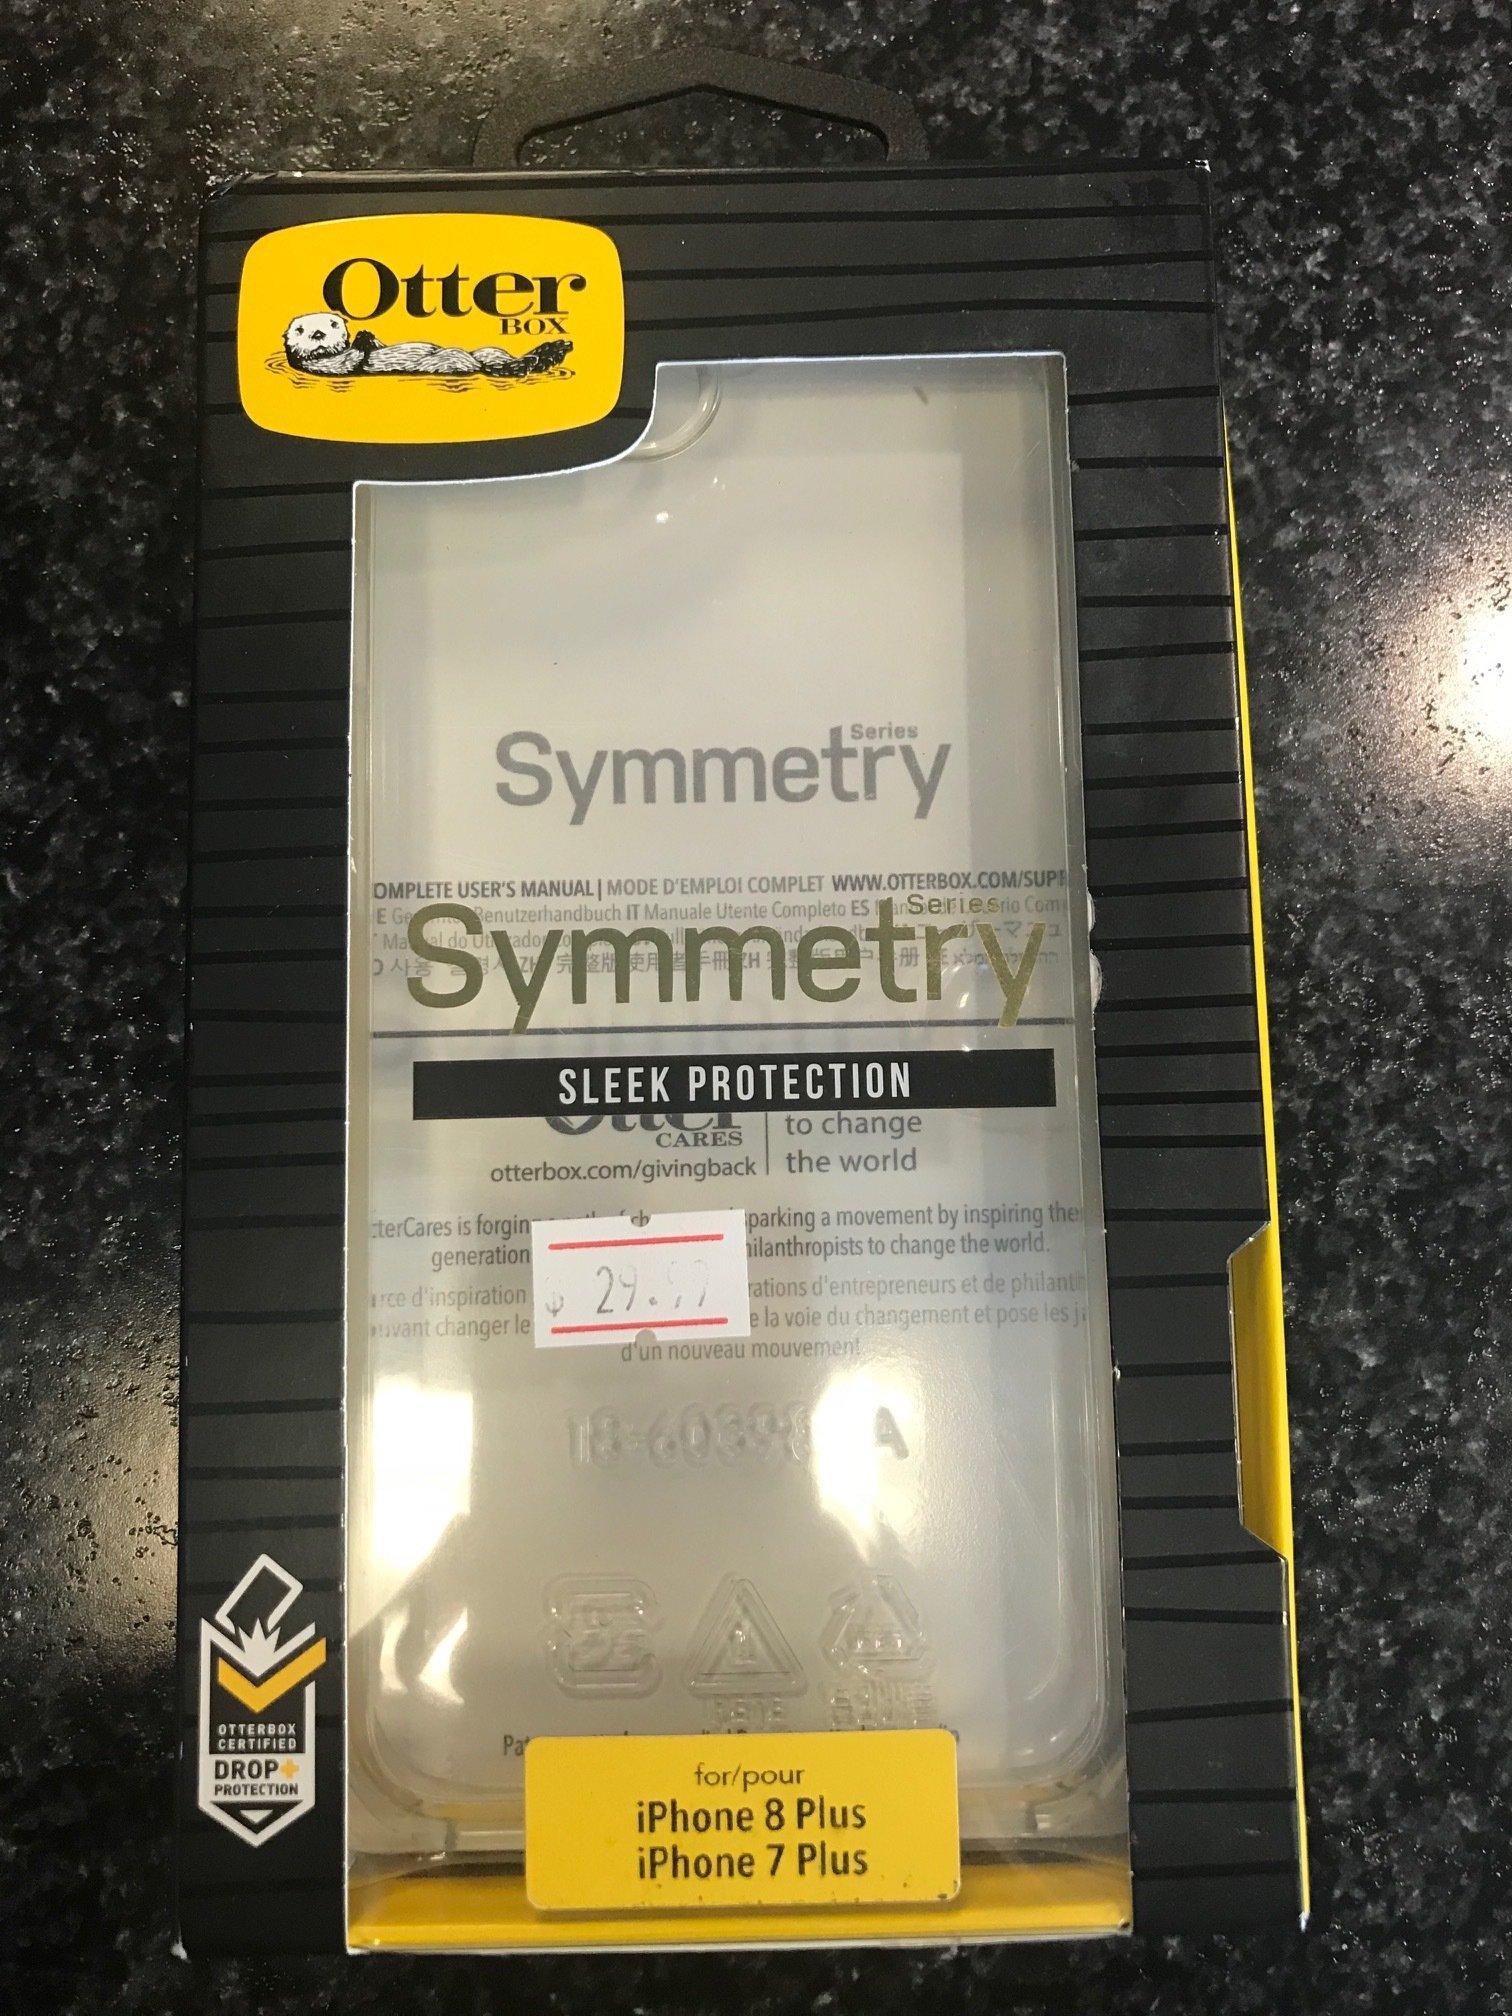 Otter Box Symmetry Case for iPhone 7 plus or iPhone 8 plus Symmetry 7/8 plus